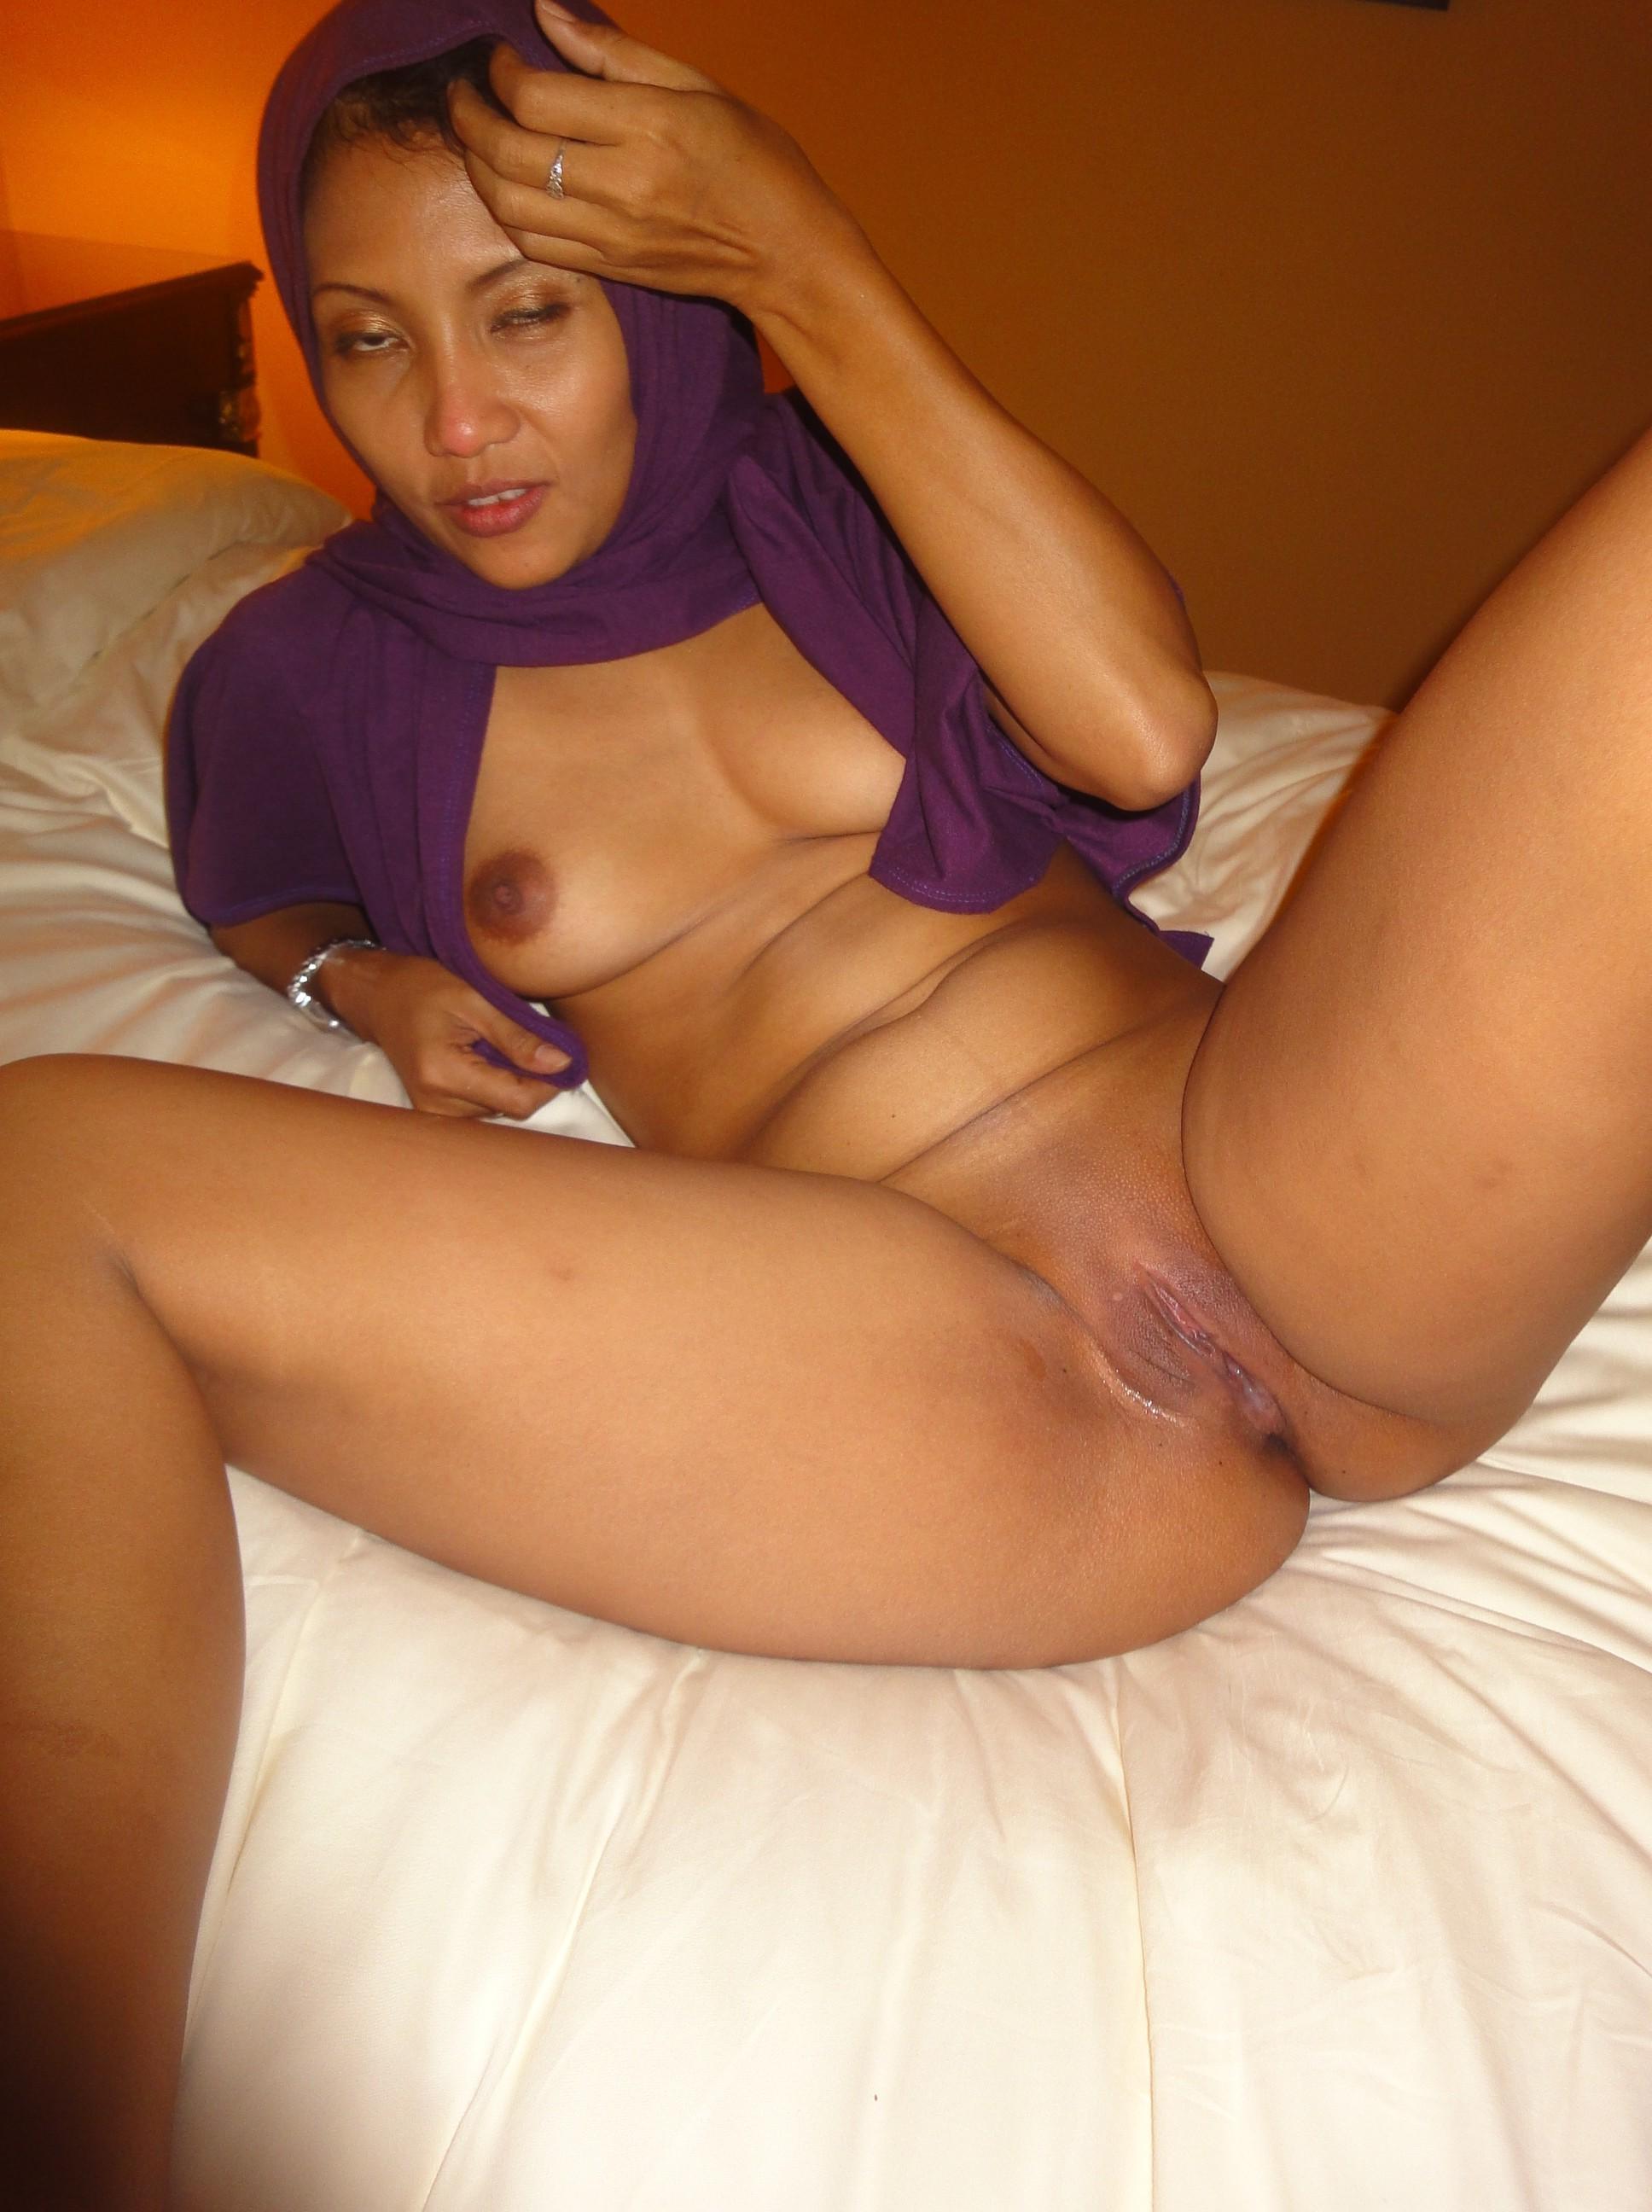 nangi muslim ladki 4 - Muslim Girl Nude Sexy Photos Nangi Images